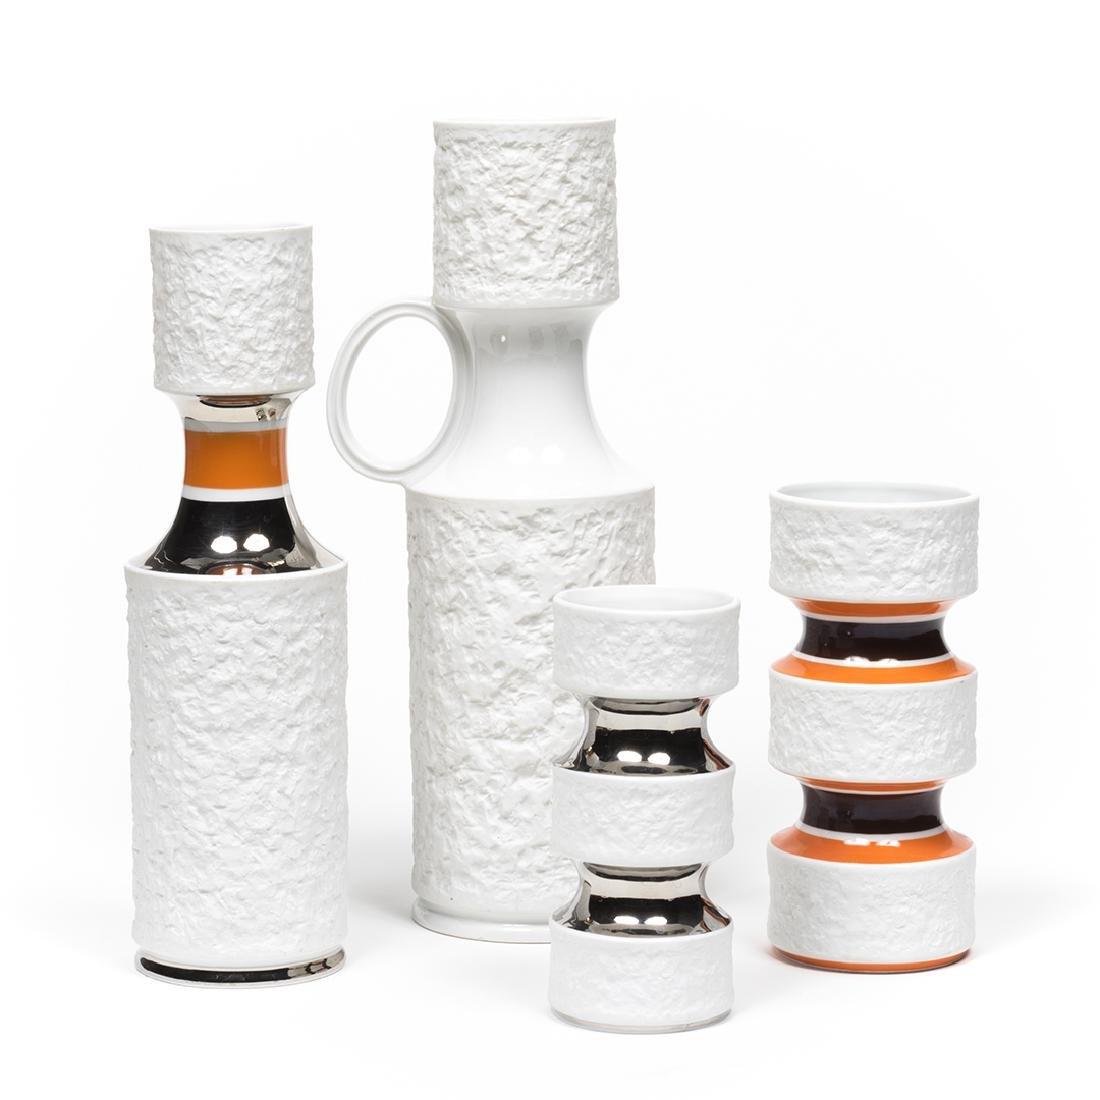 KPM Bisque Vases